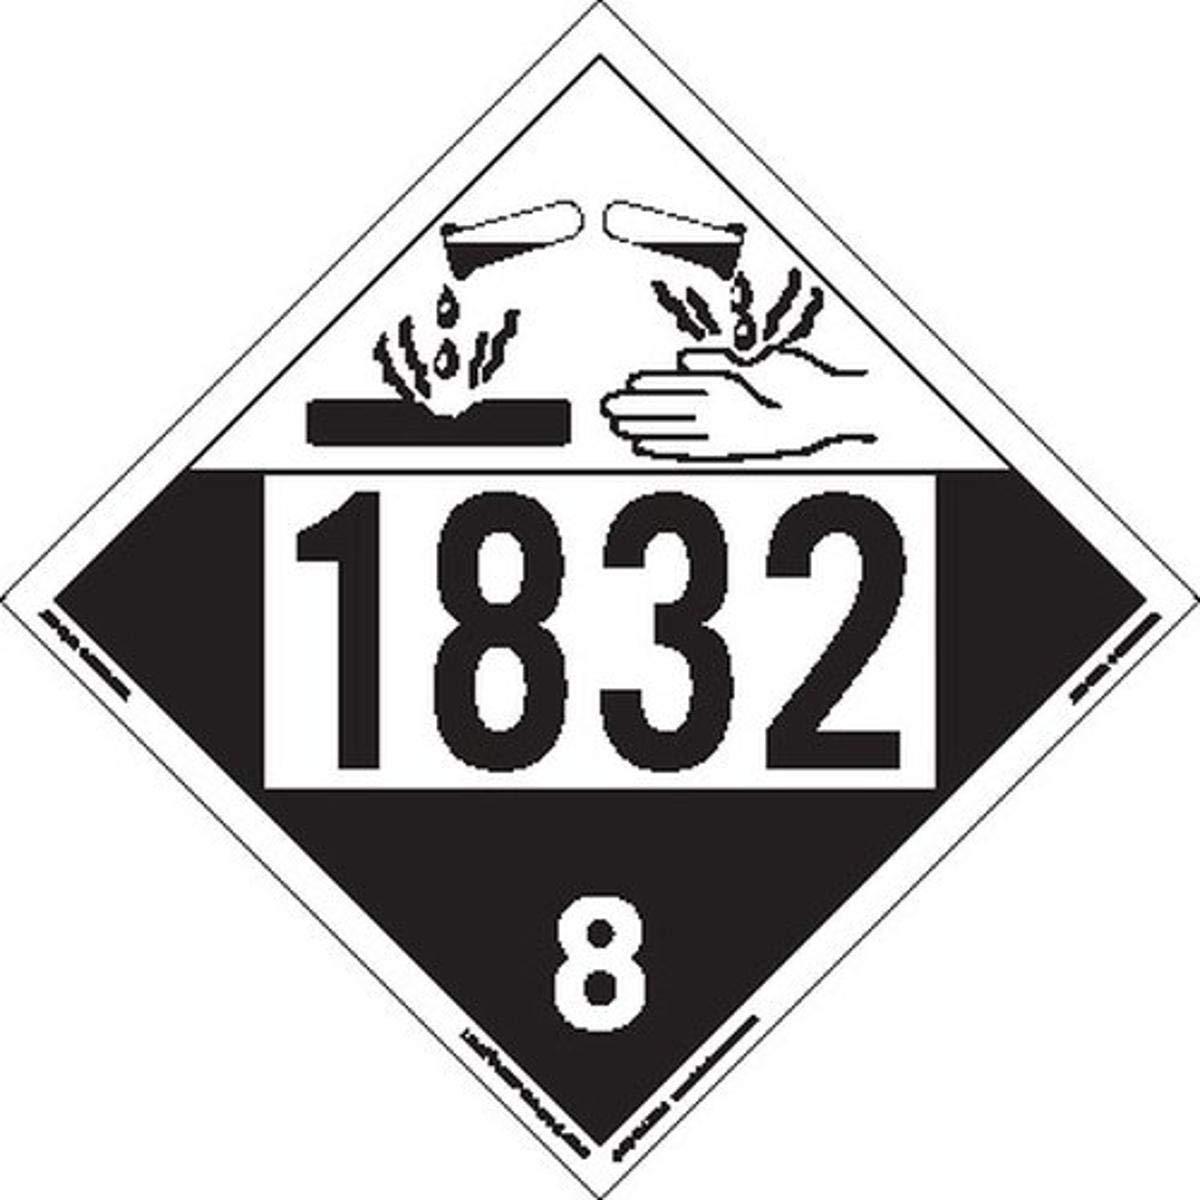 Labelmaster ZT4-1832 Max 49% OFF UN Ranking TOP4 1832 Corrosive Placard Tagboard Hazmat